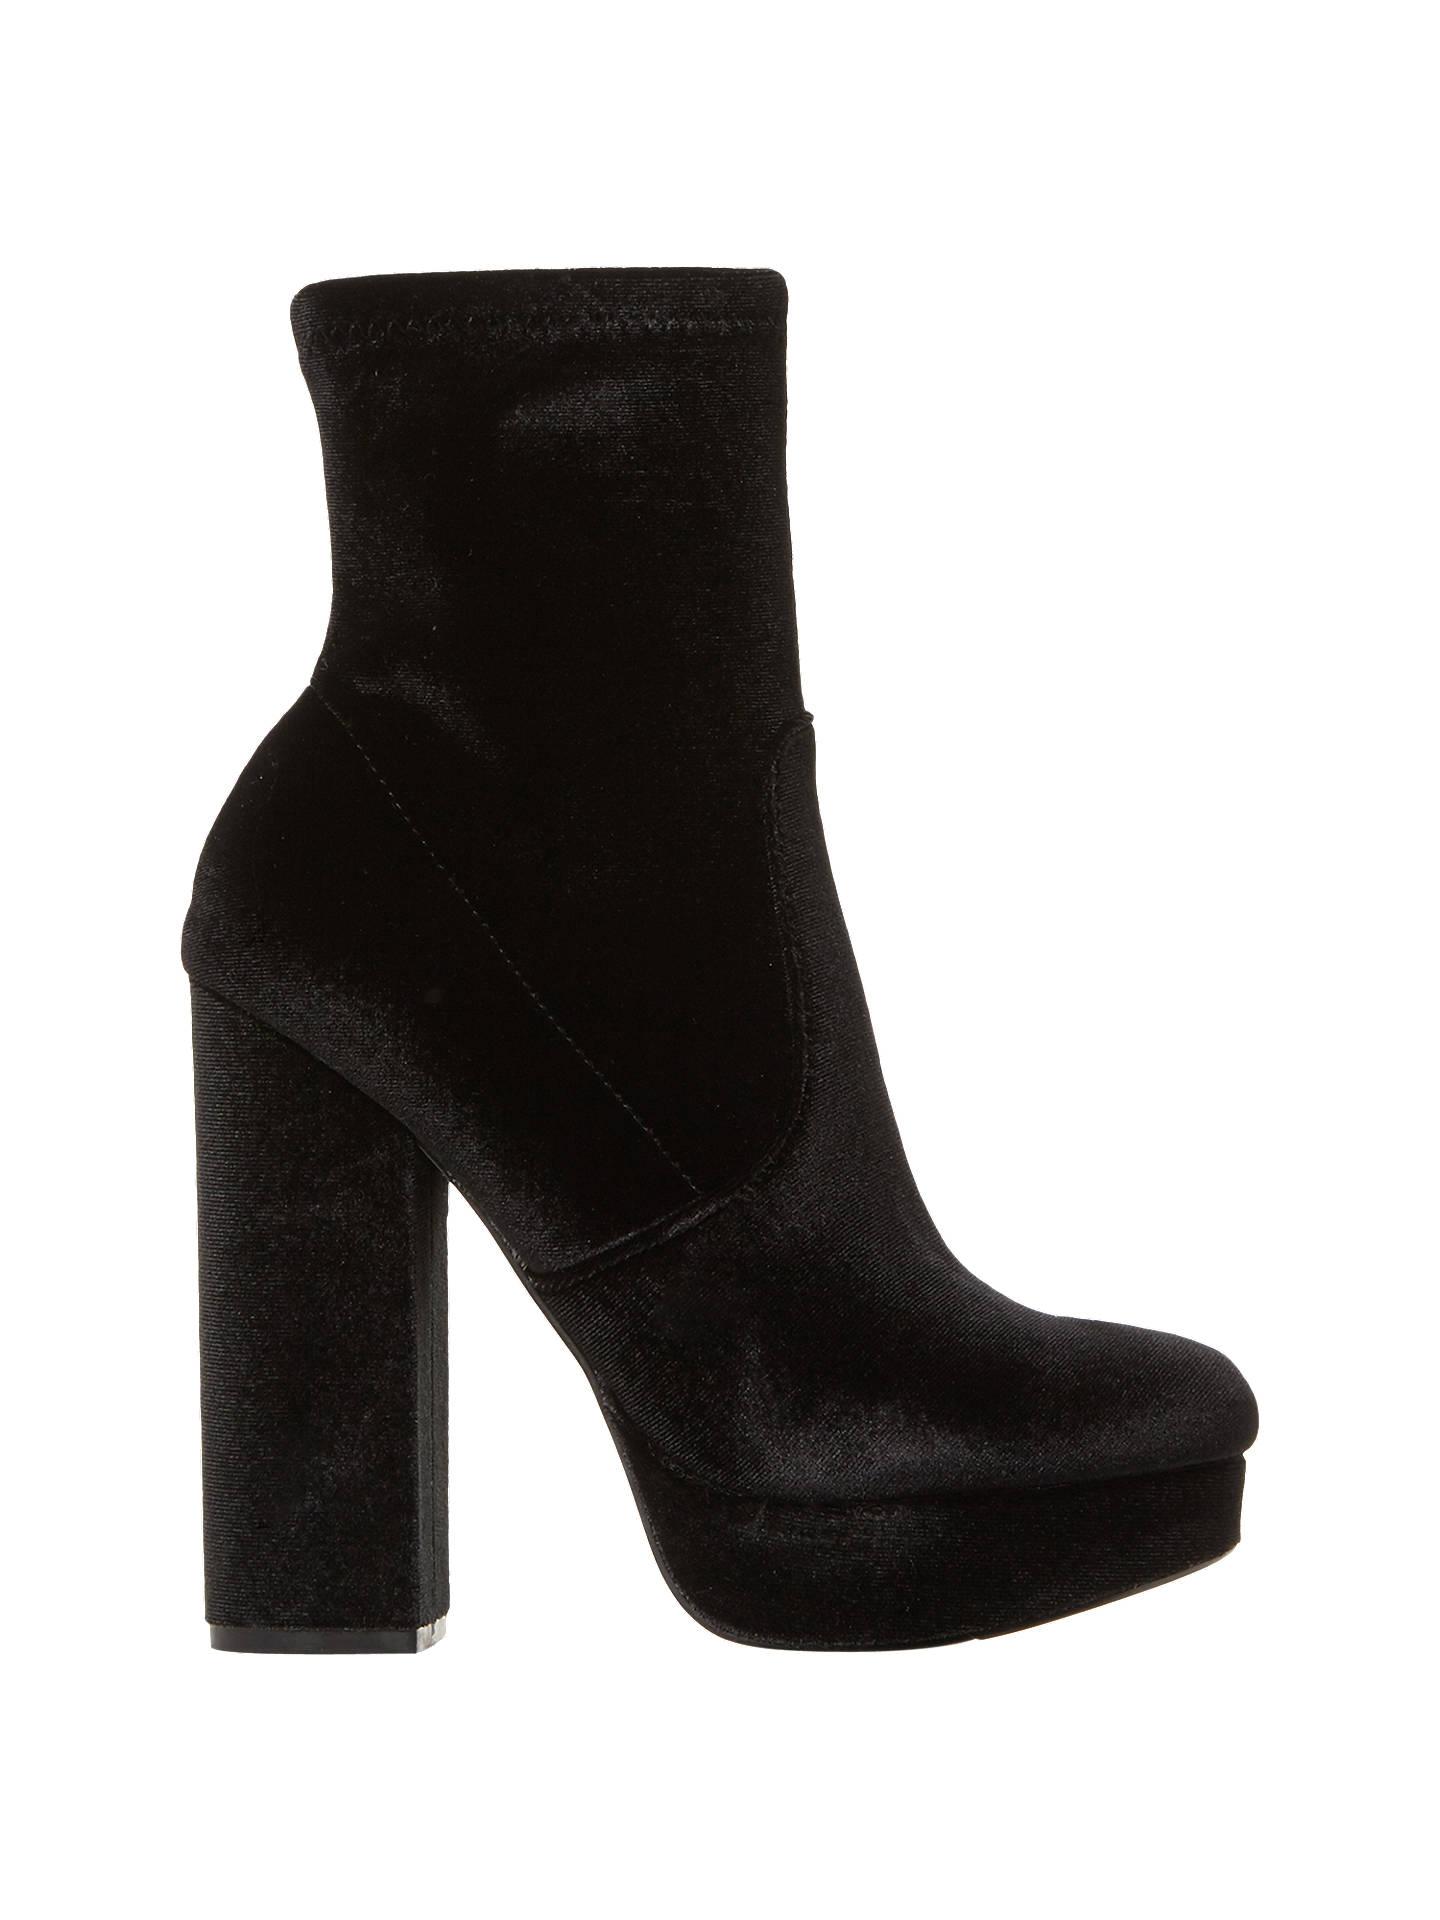 13bb231f5a0 Steve Madden Stardust Platform Block Heeled Ankle Boots, Black at ...